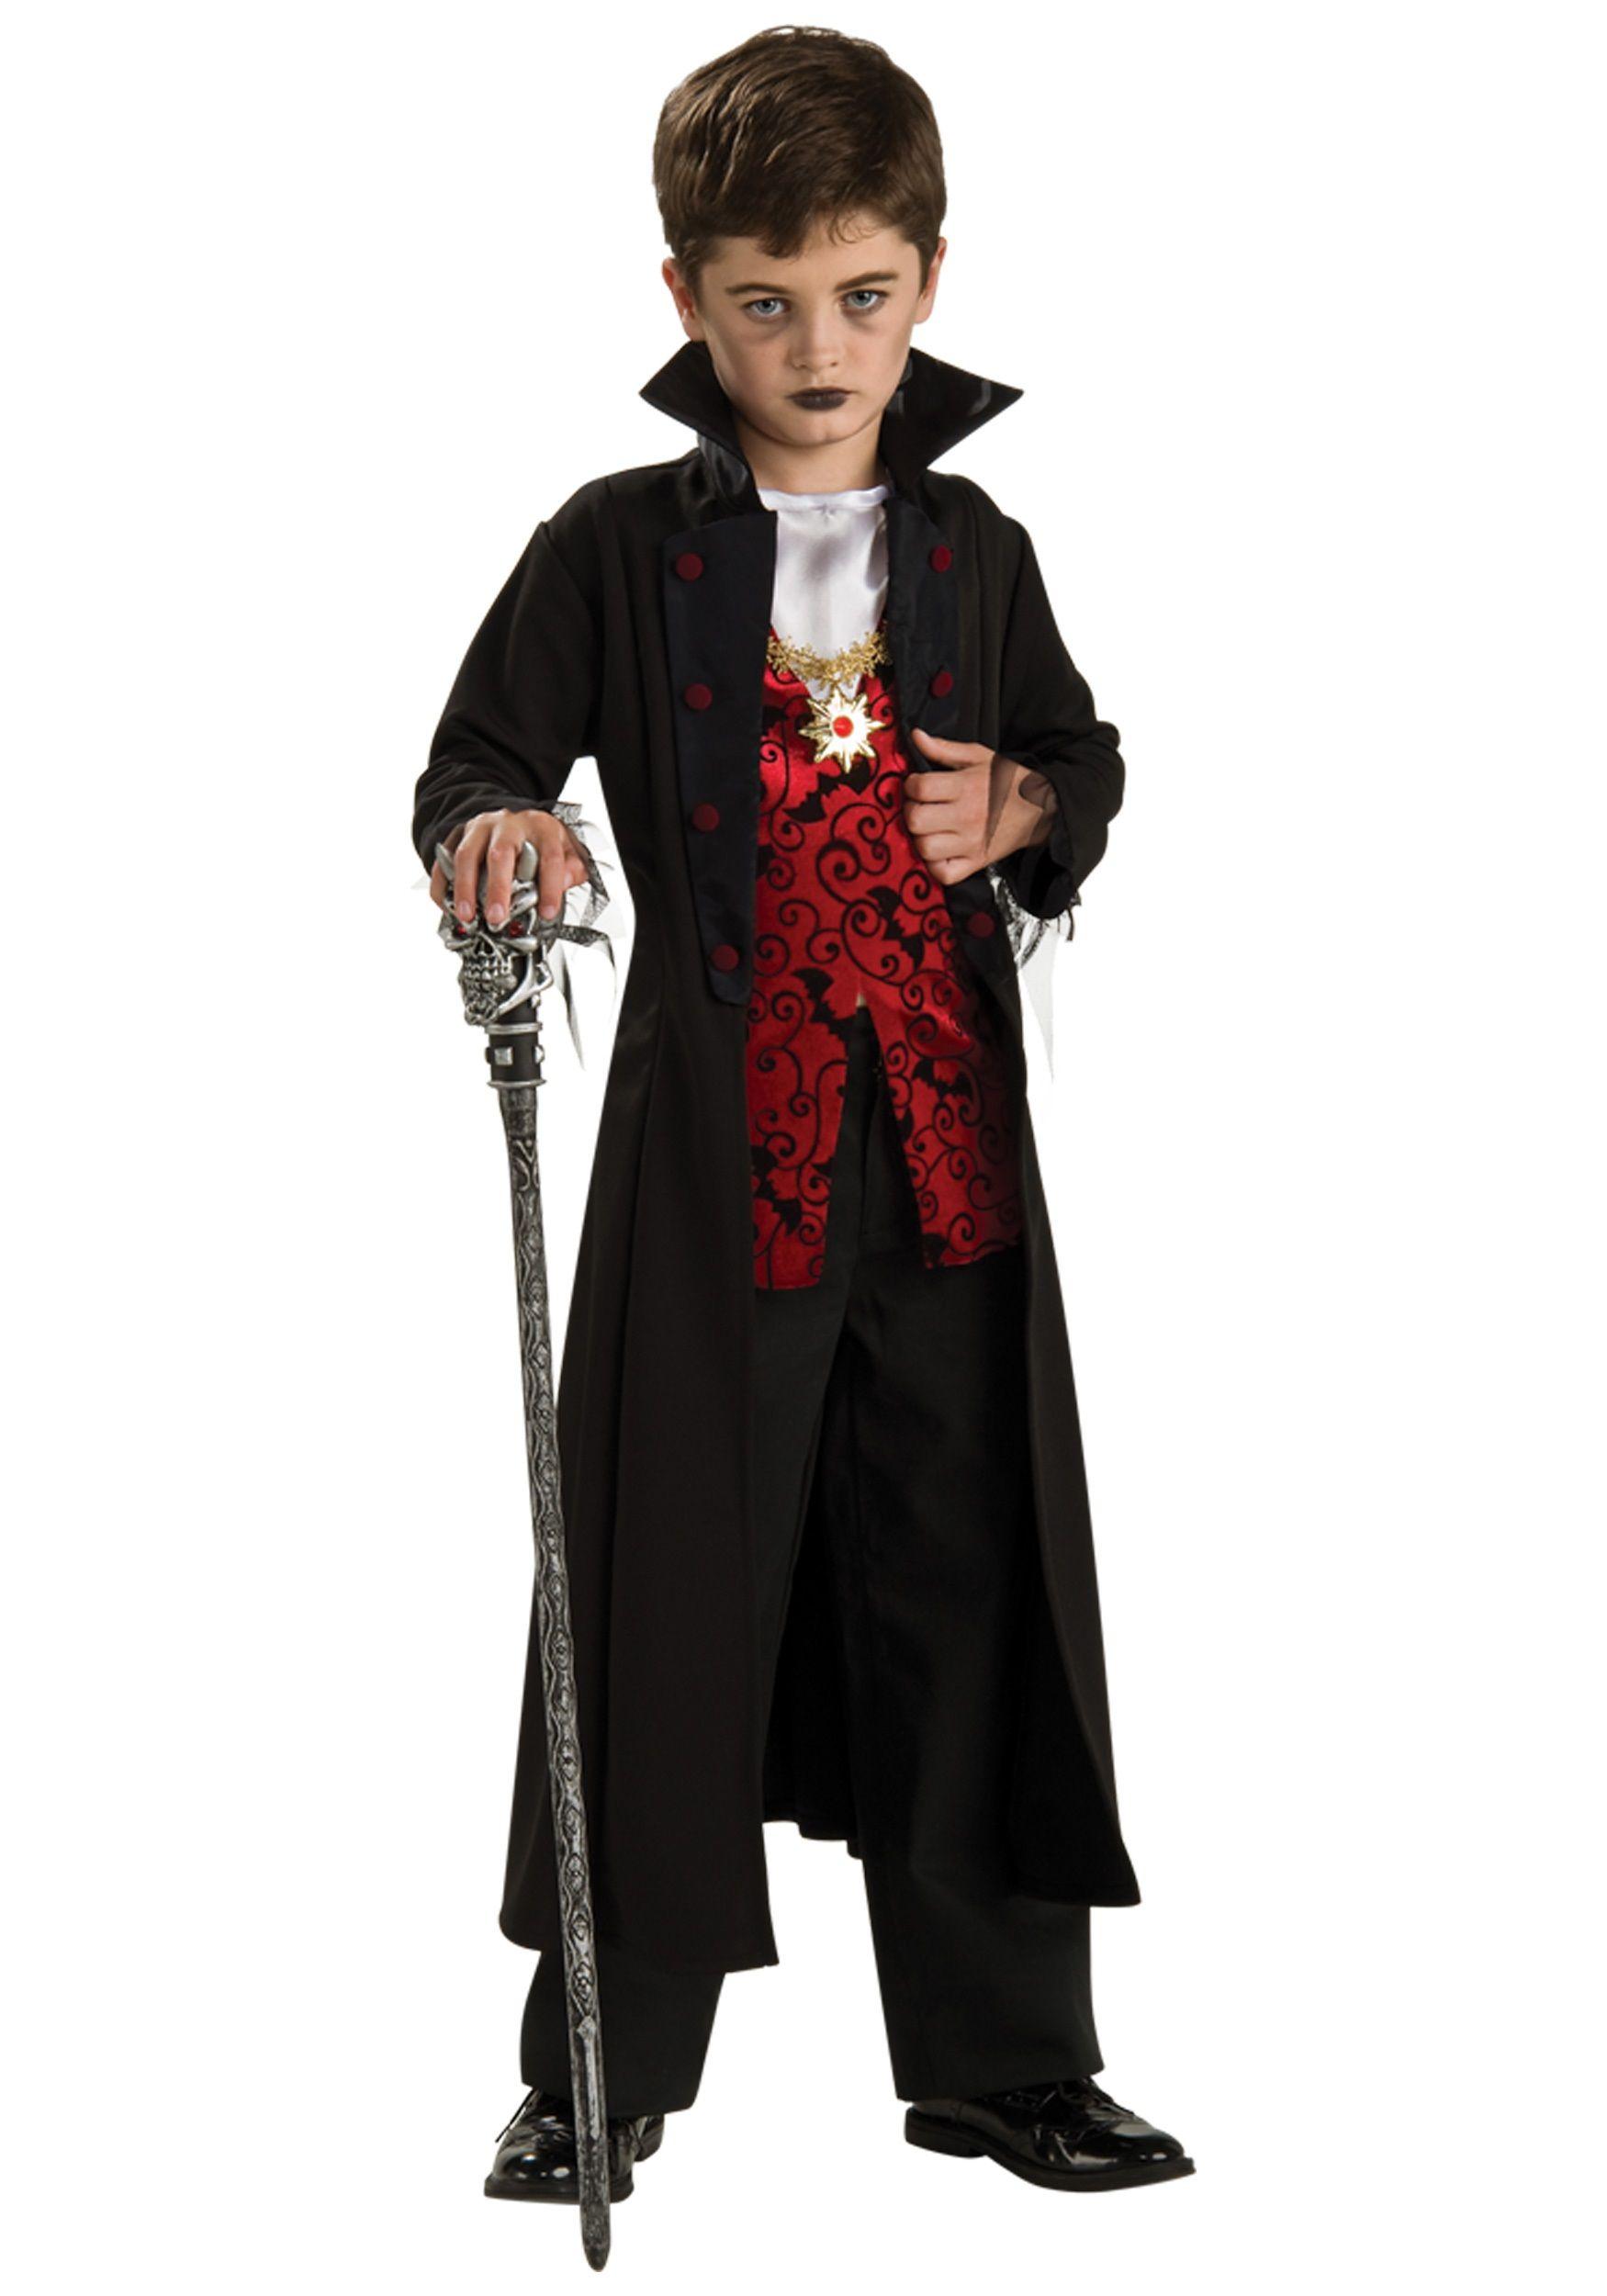 Rubies Costume Transylvanian Vampire Costume with Short Cape Costume